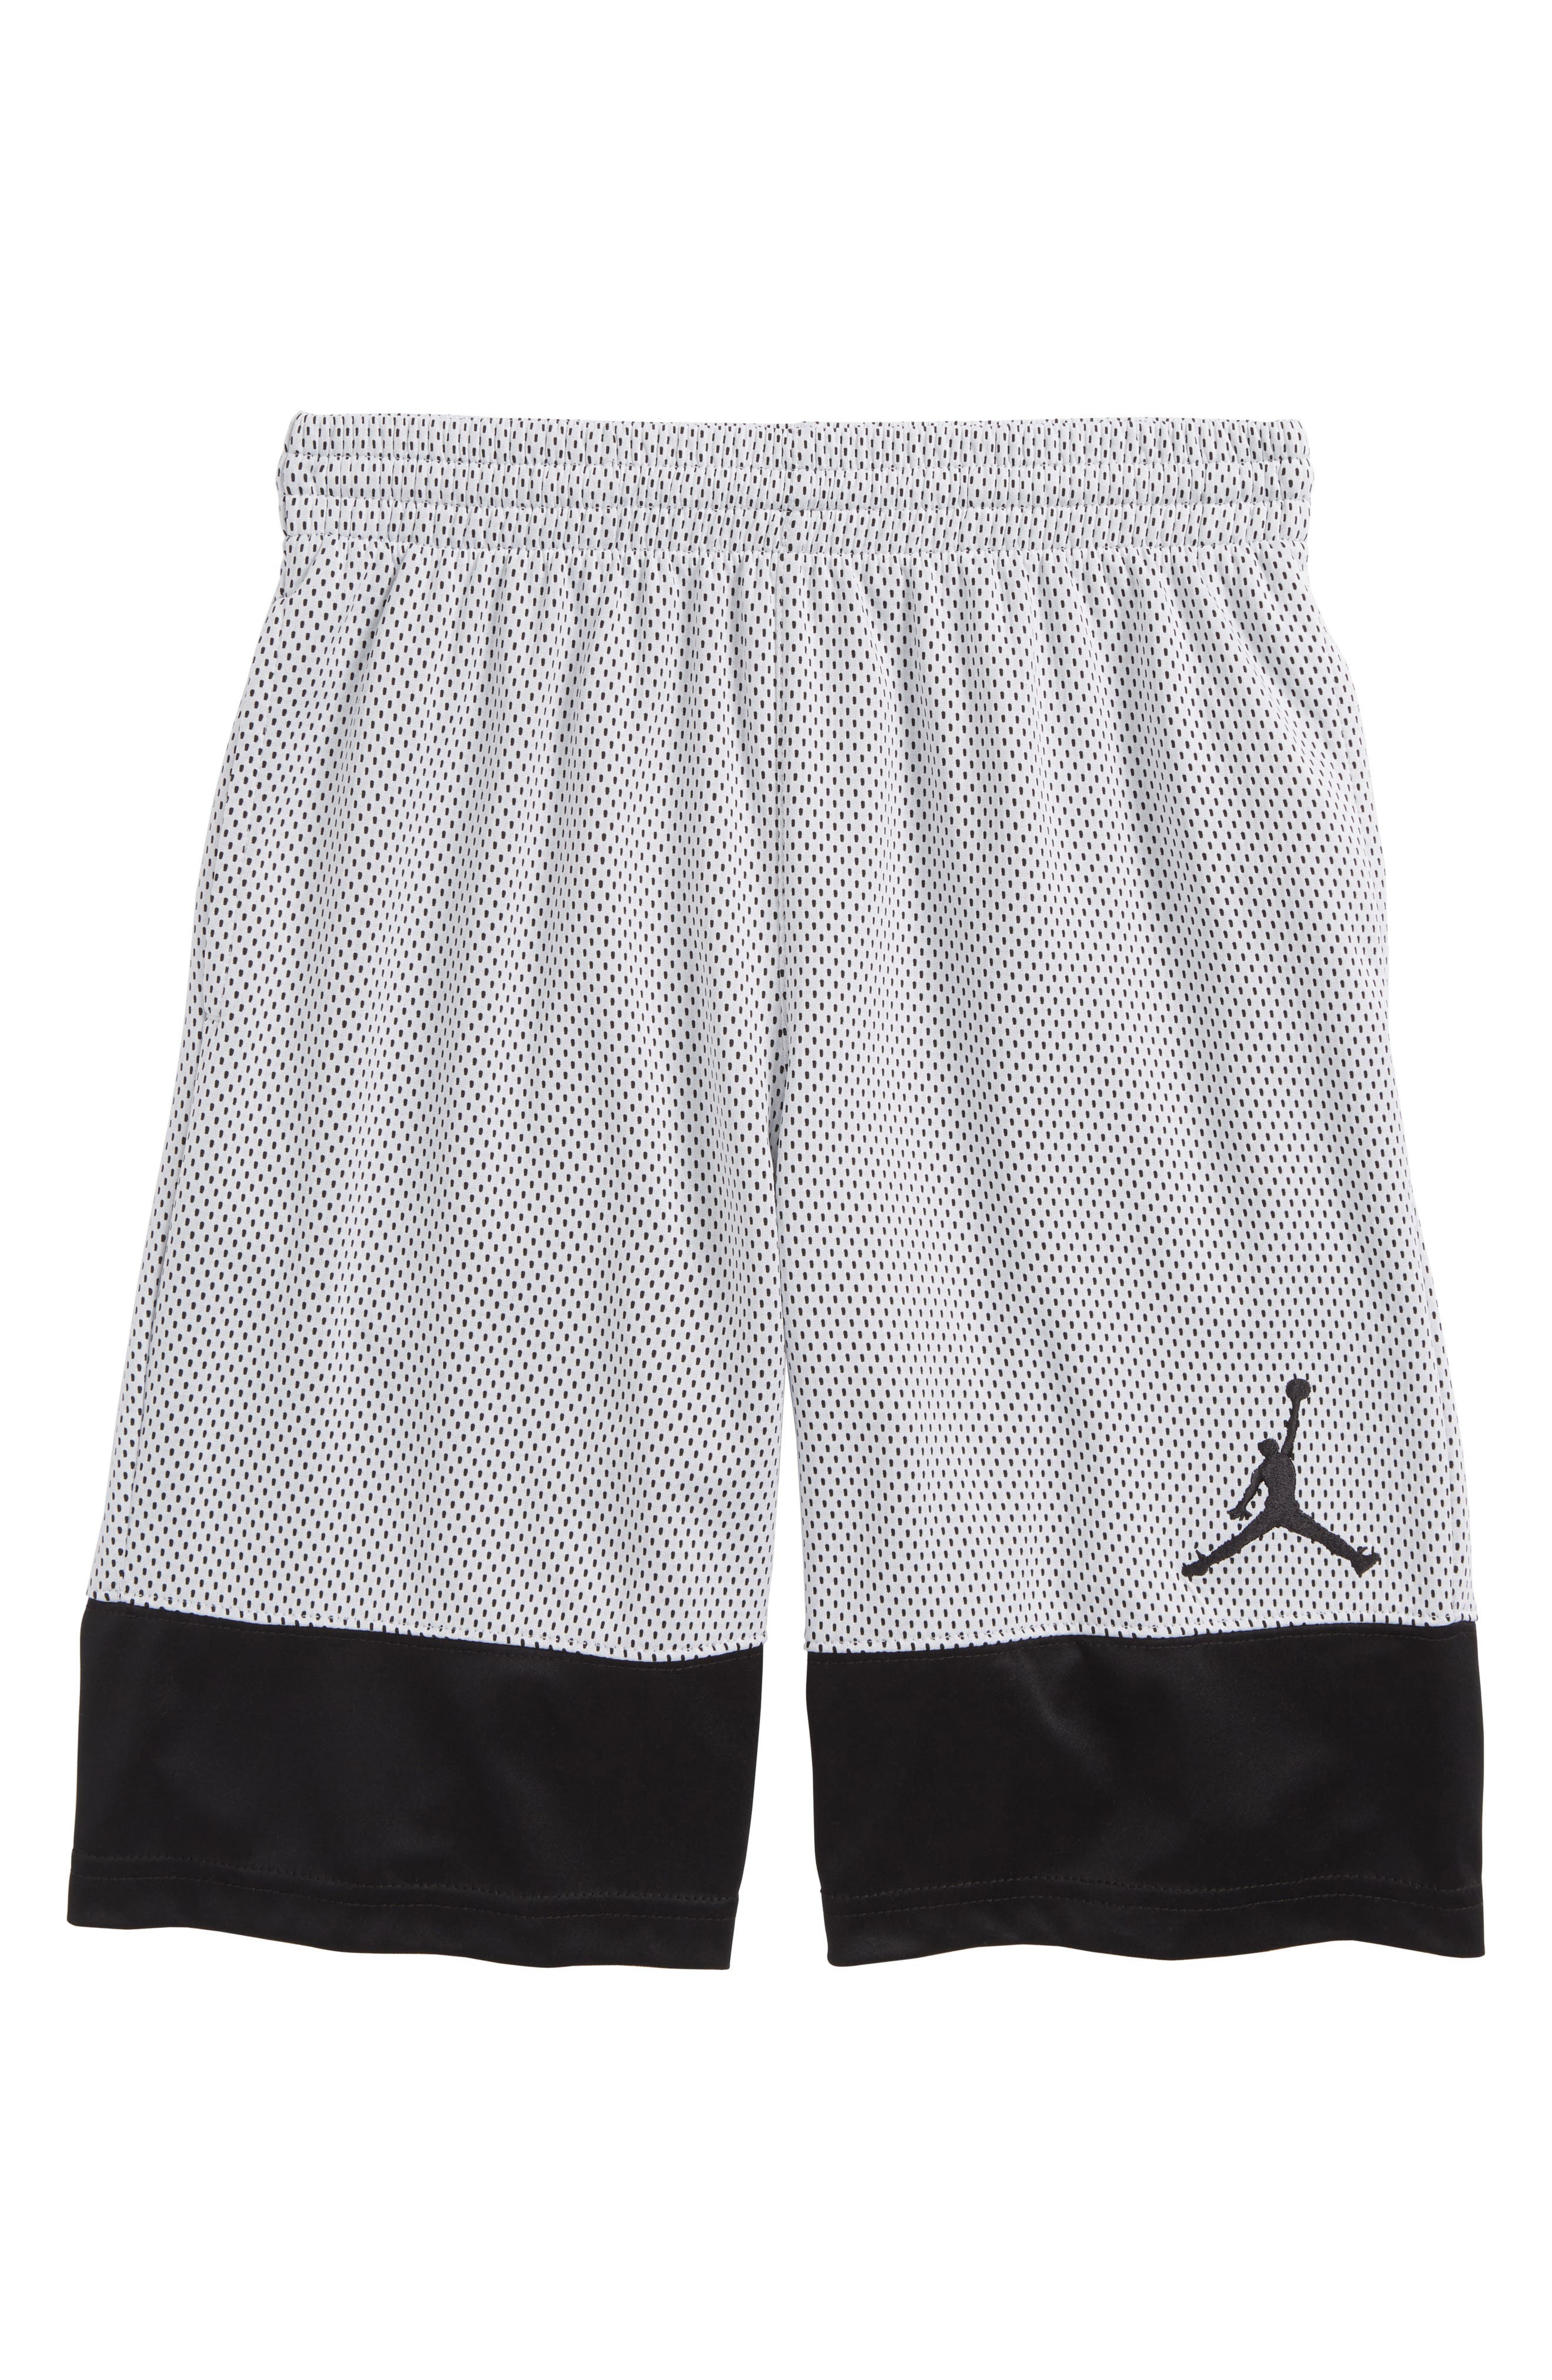 Jordan AJ 90s D2 Mesh Shorts,                         Main,                         color, 001